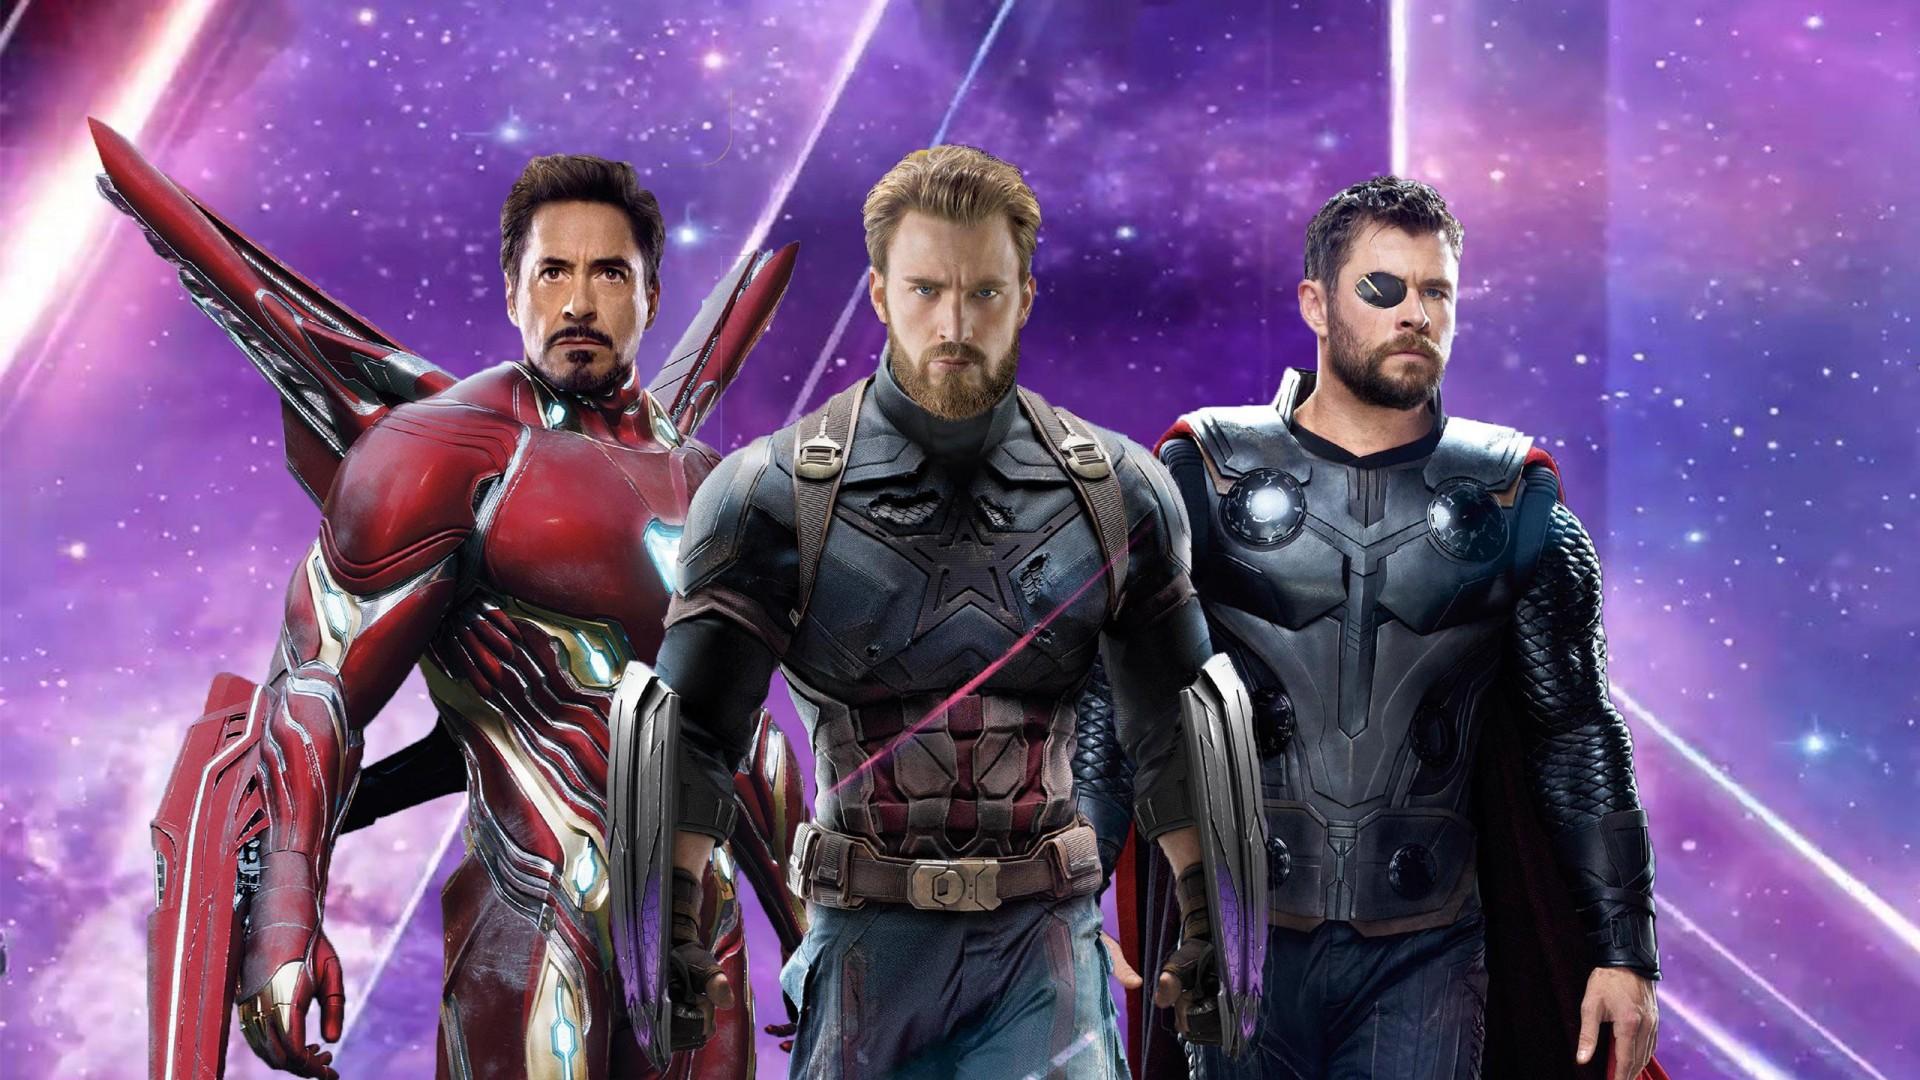 Iron Man Captain America Thor in Avengers Infinity War Wallpaper 1920x1080